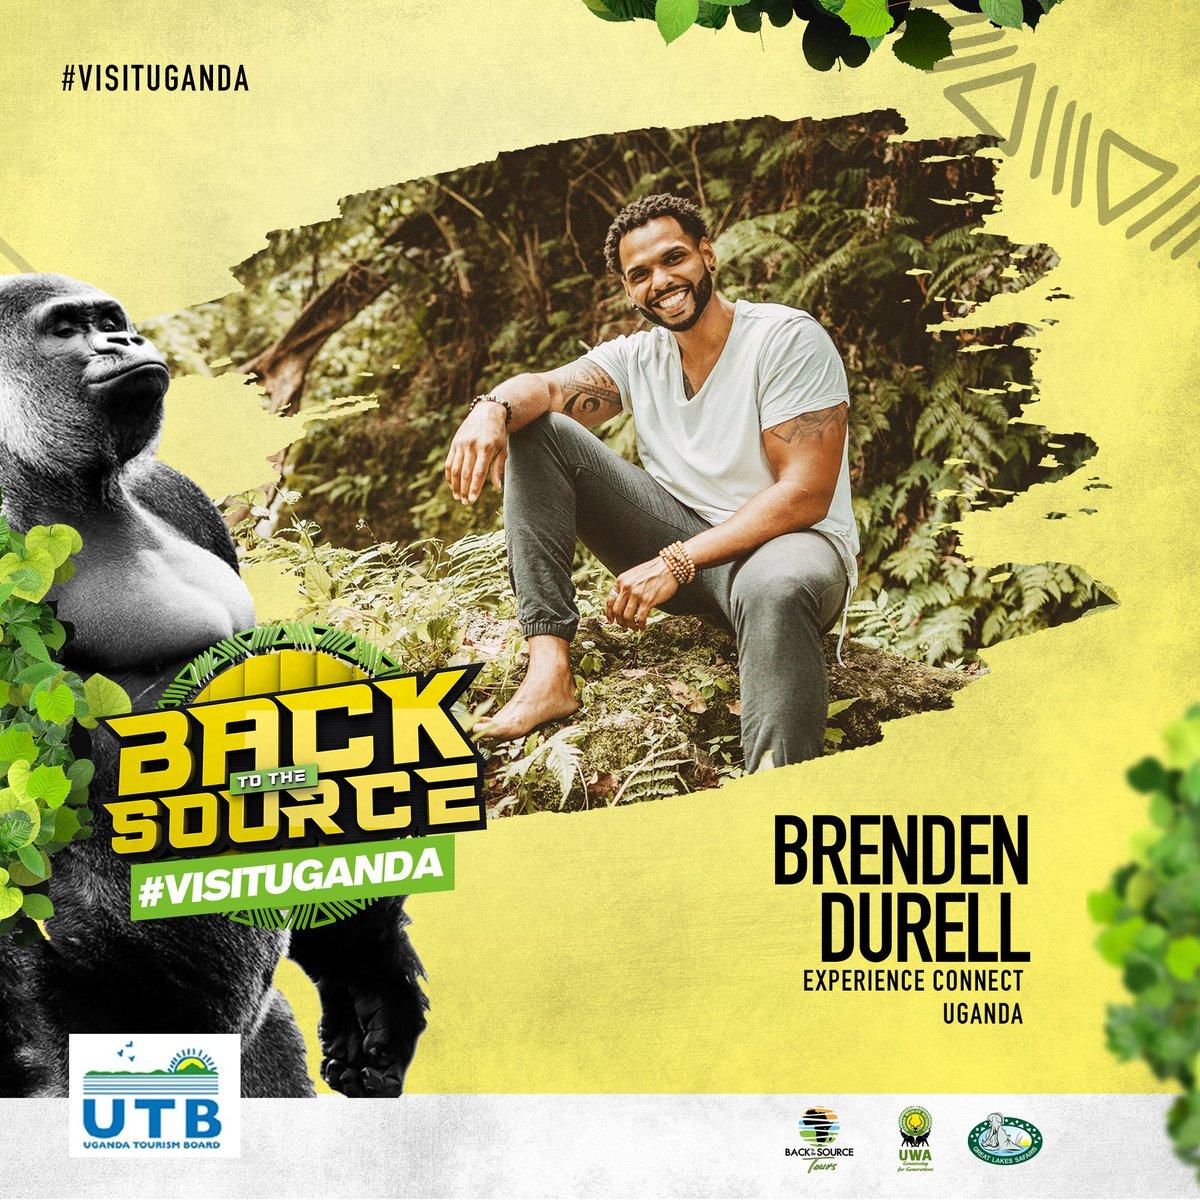 Welcome to Uganda the Pearl of Africa Brenden Durell.  #BackToTheSourceTours #PearlofAfrica #VisitUganda #ExperienceUganda #TulambuleWild #GreatLakesSafaris #BrendenDurell #InnerLightWarrior